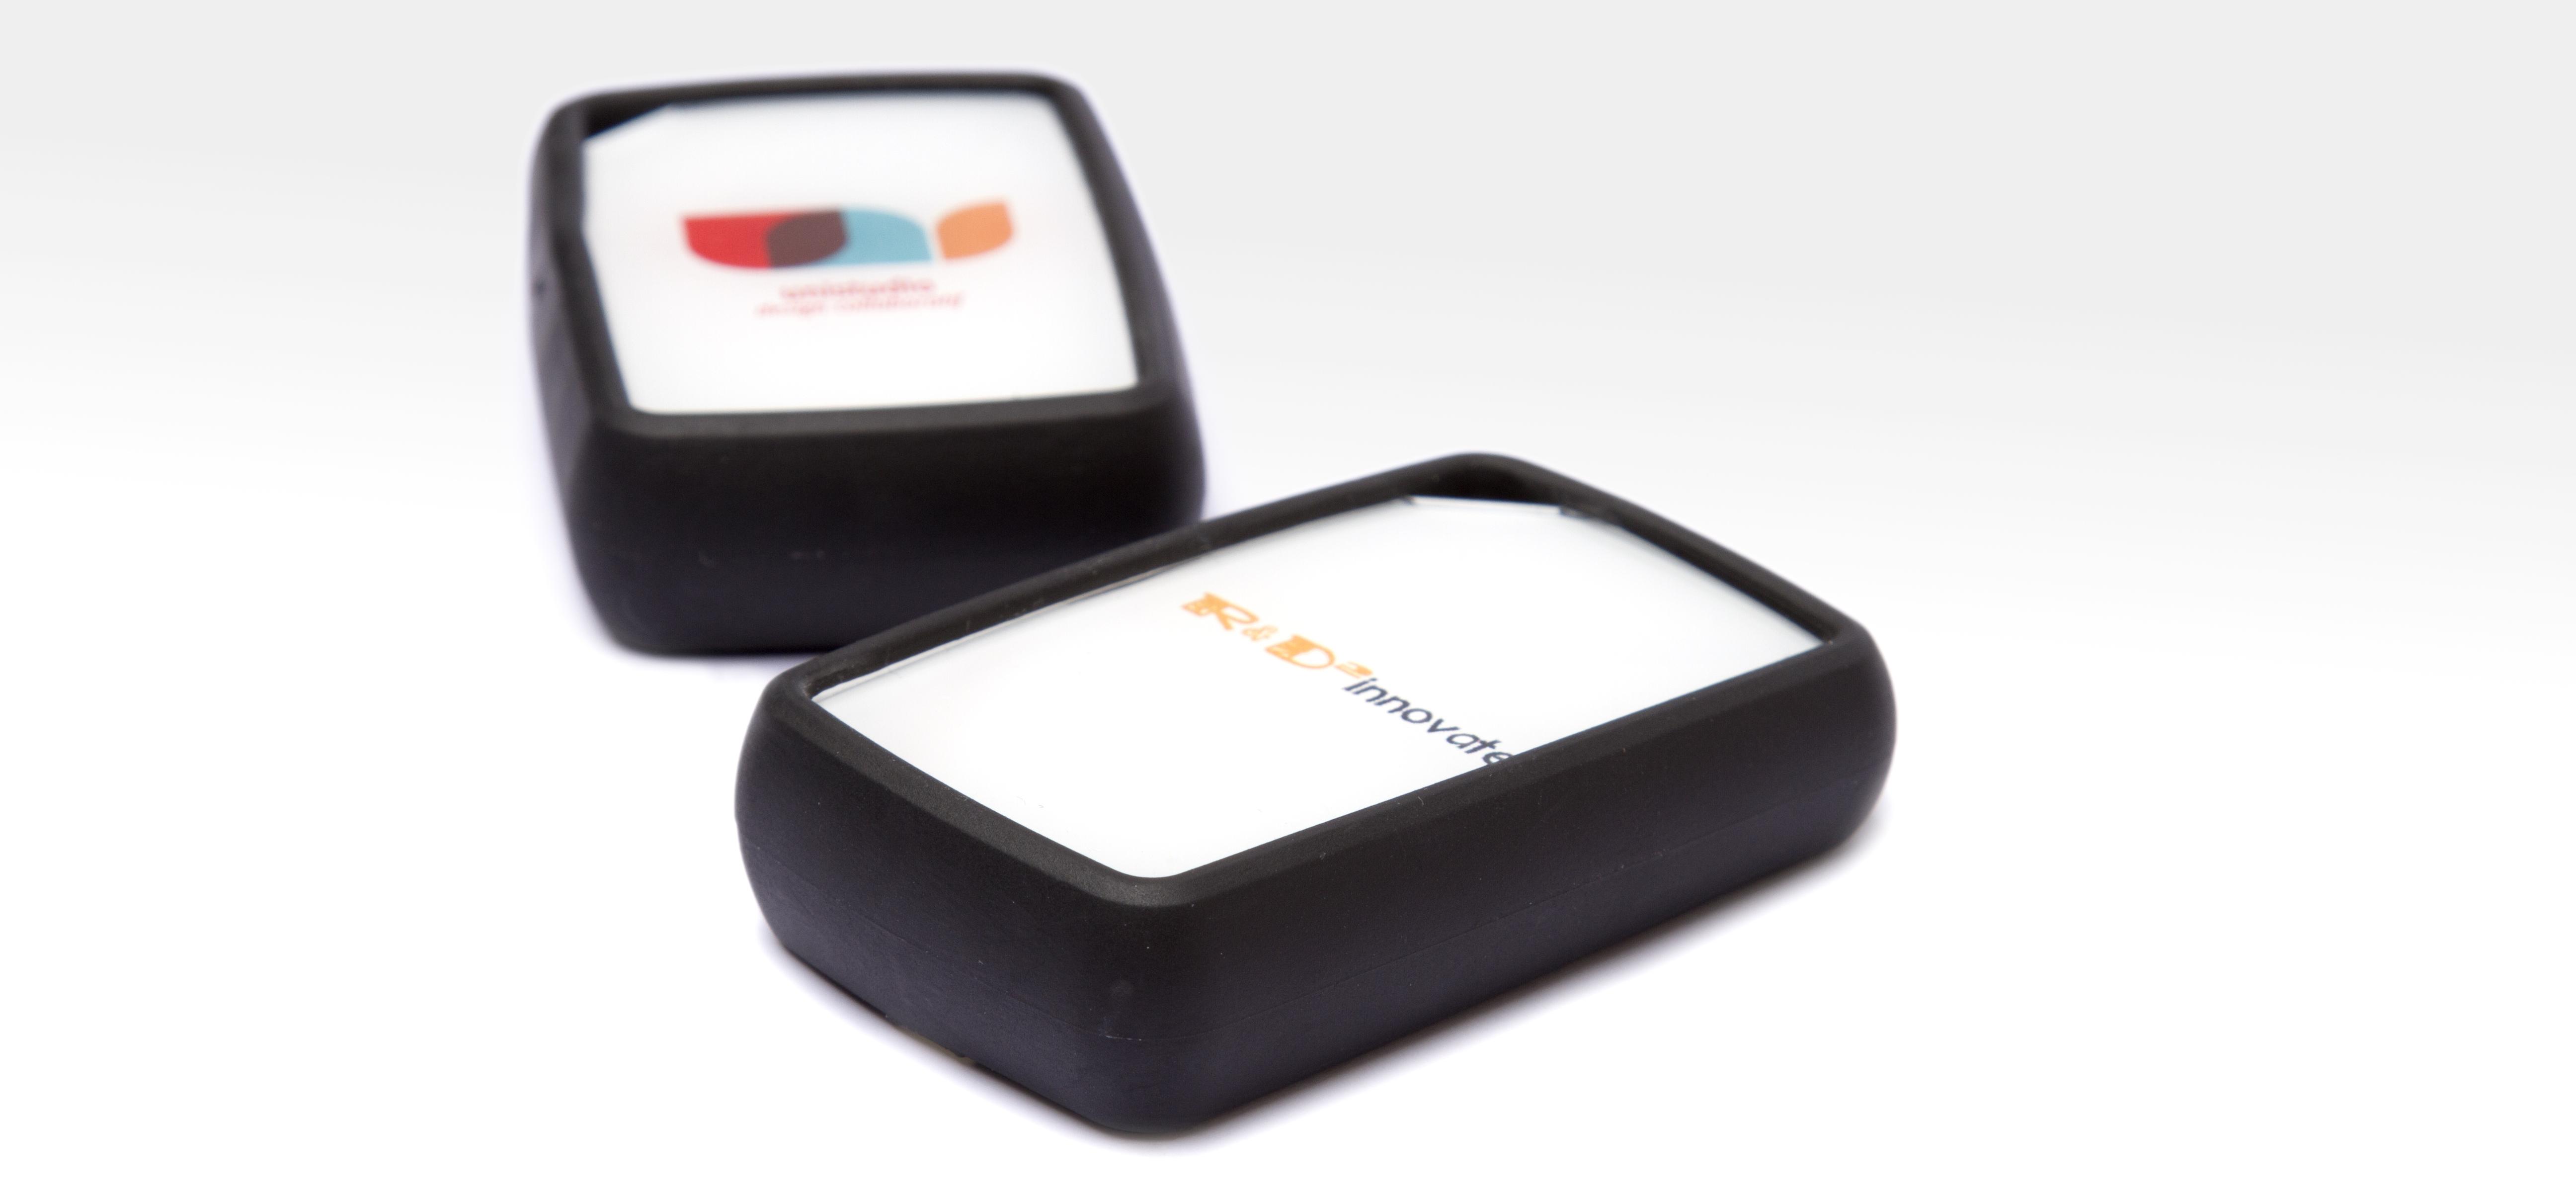 unistudio_trustdesigner_tedego_boitier_biometrique_design_image-de-communication_02